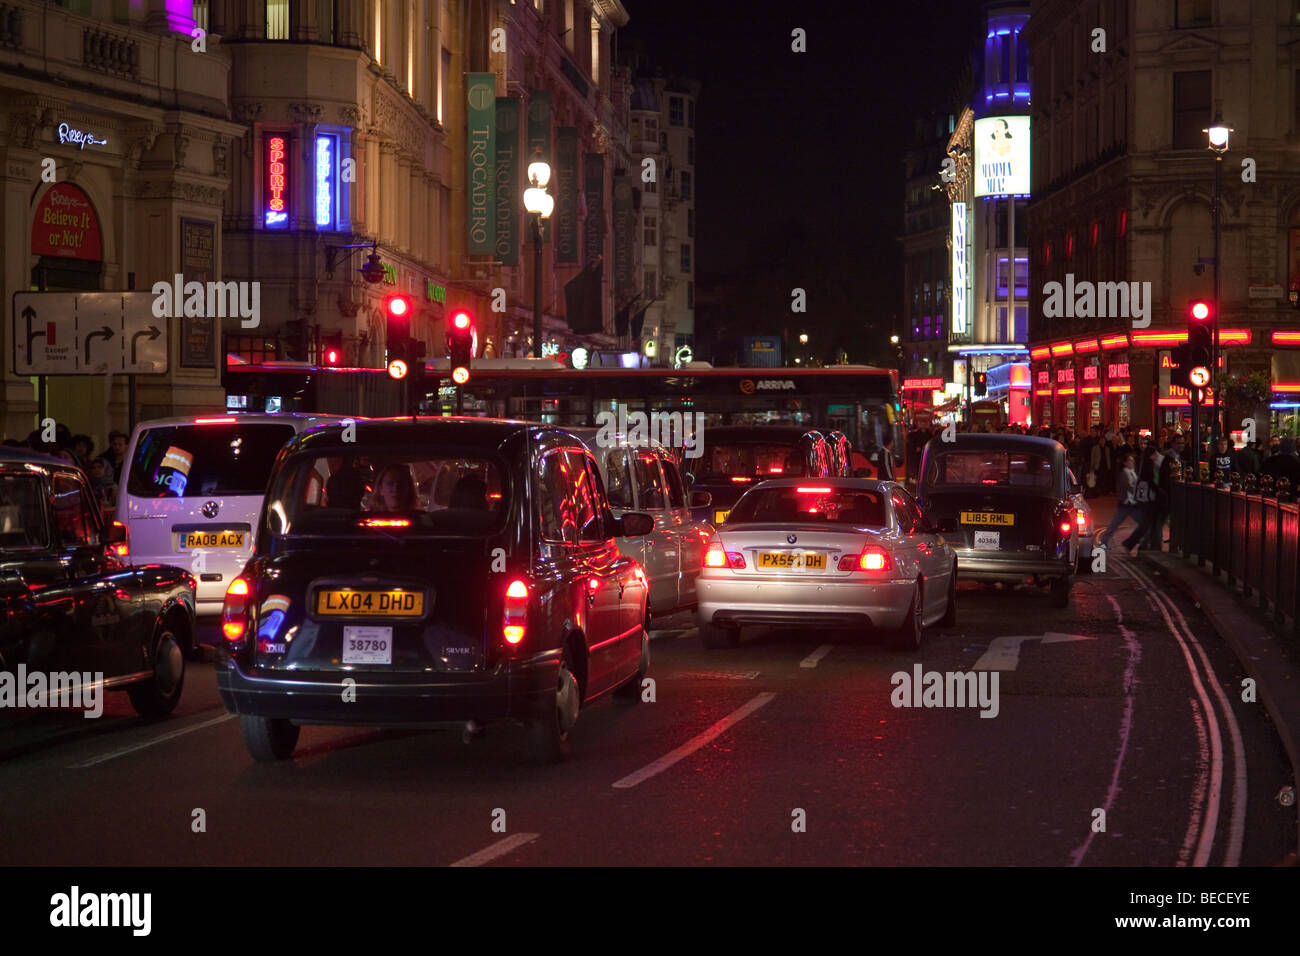 night traffic at Piccadilly Circus, London, England, UK - Stock Image